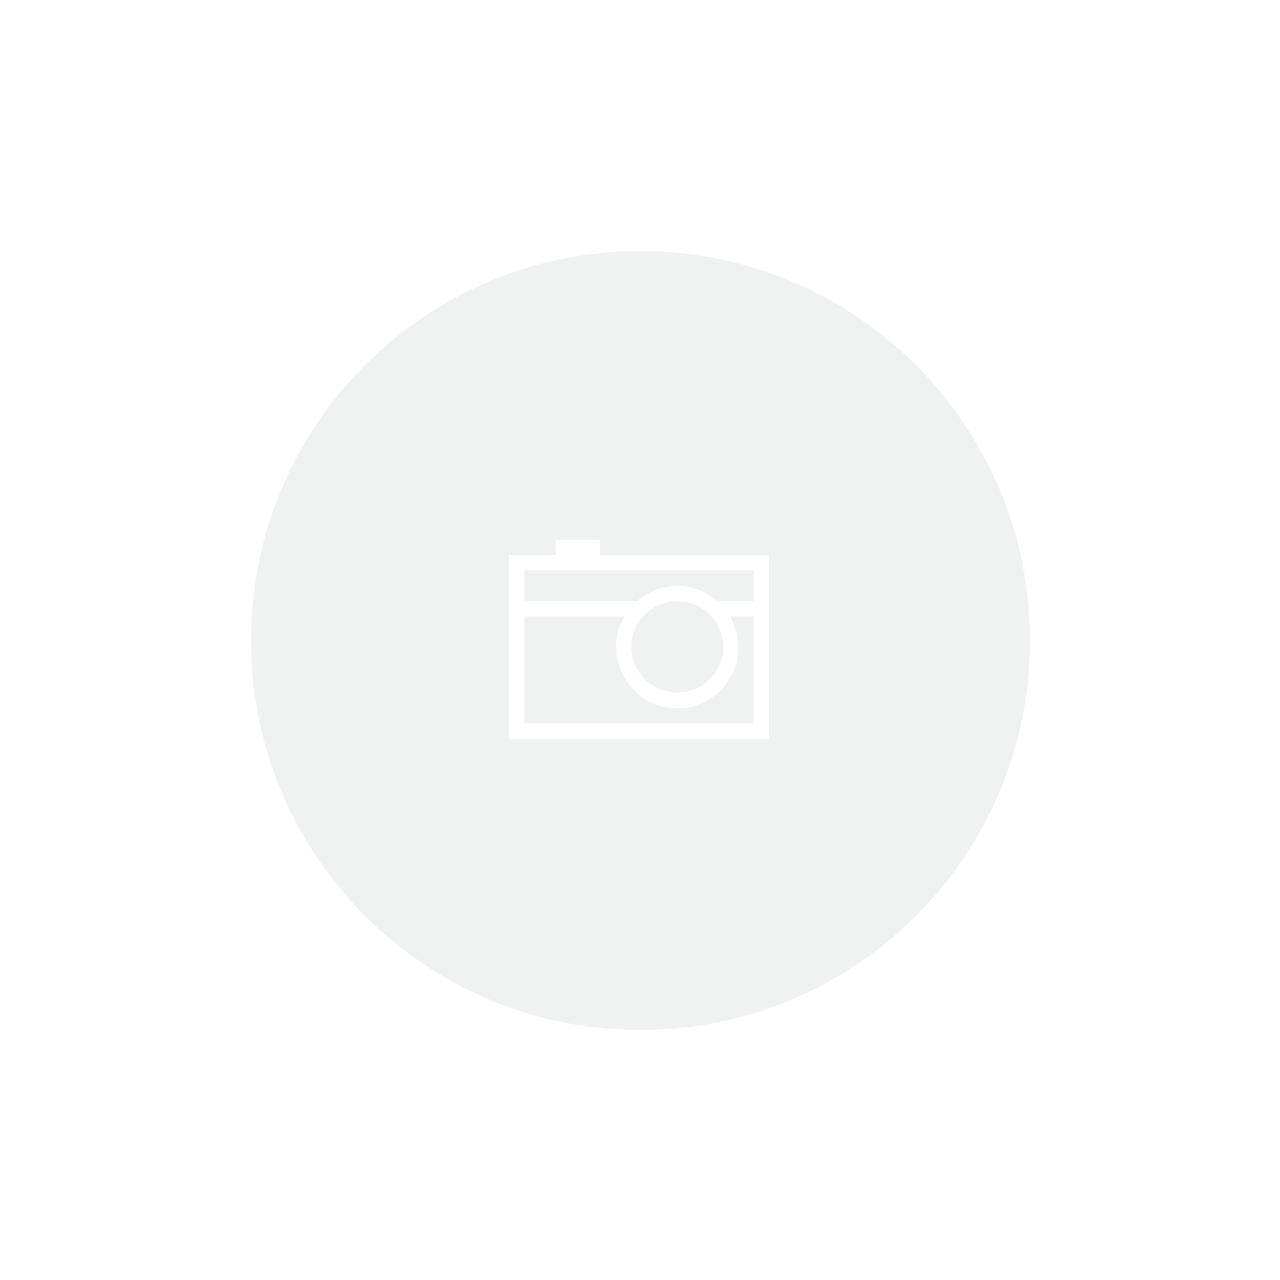 Amaryllis Branco